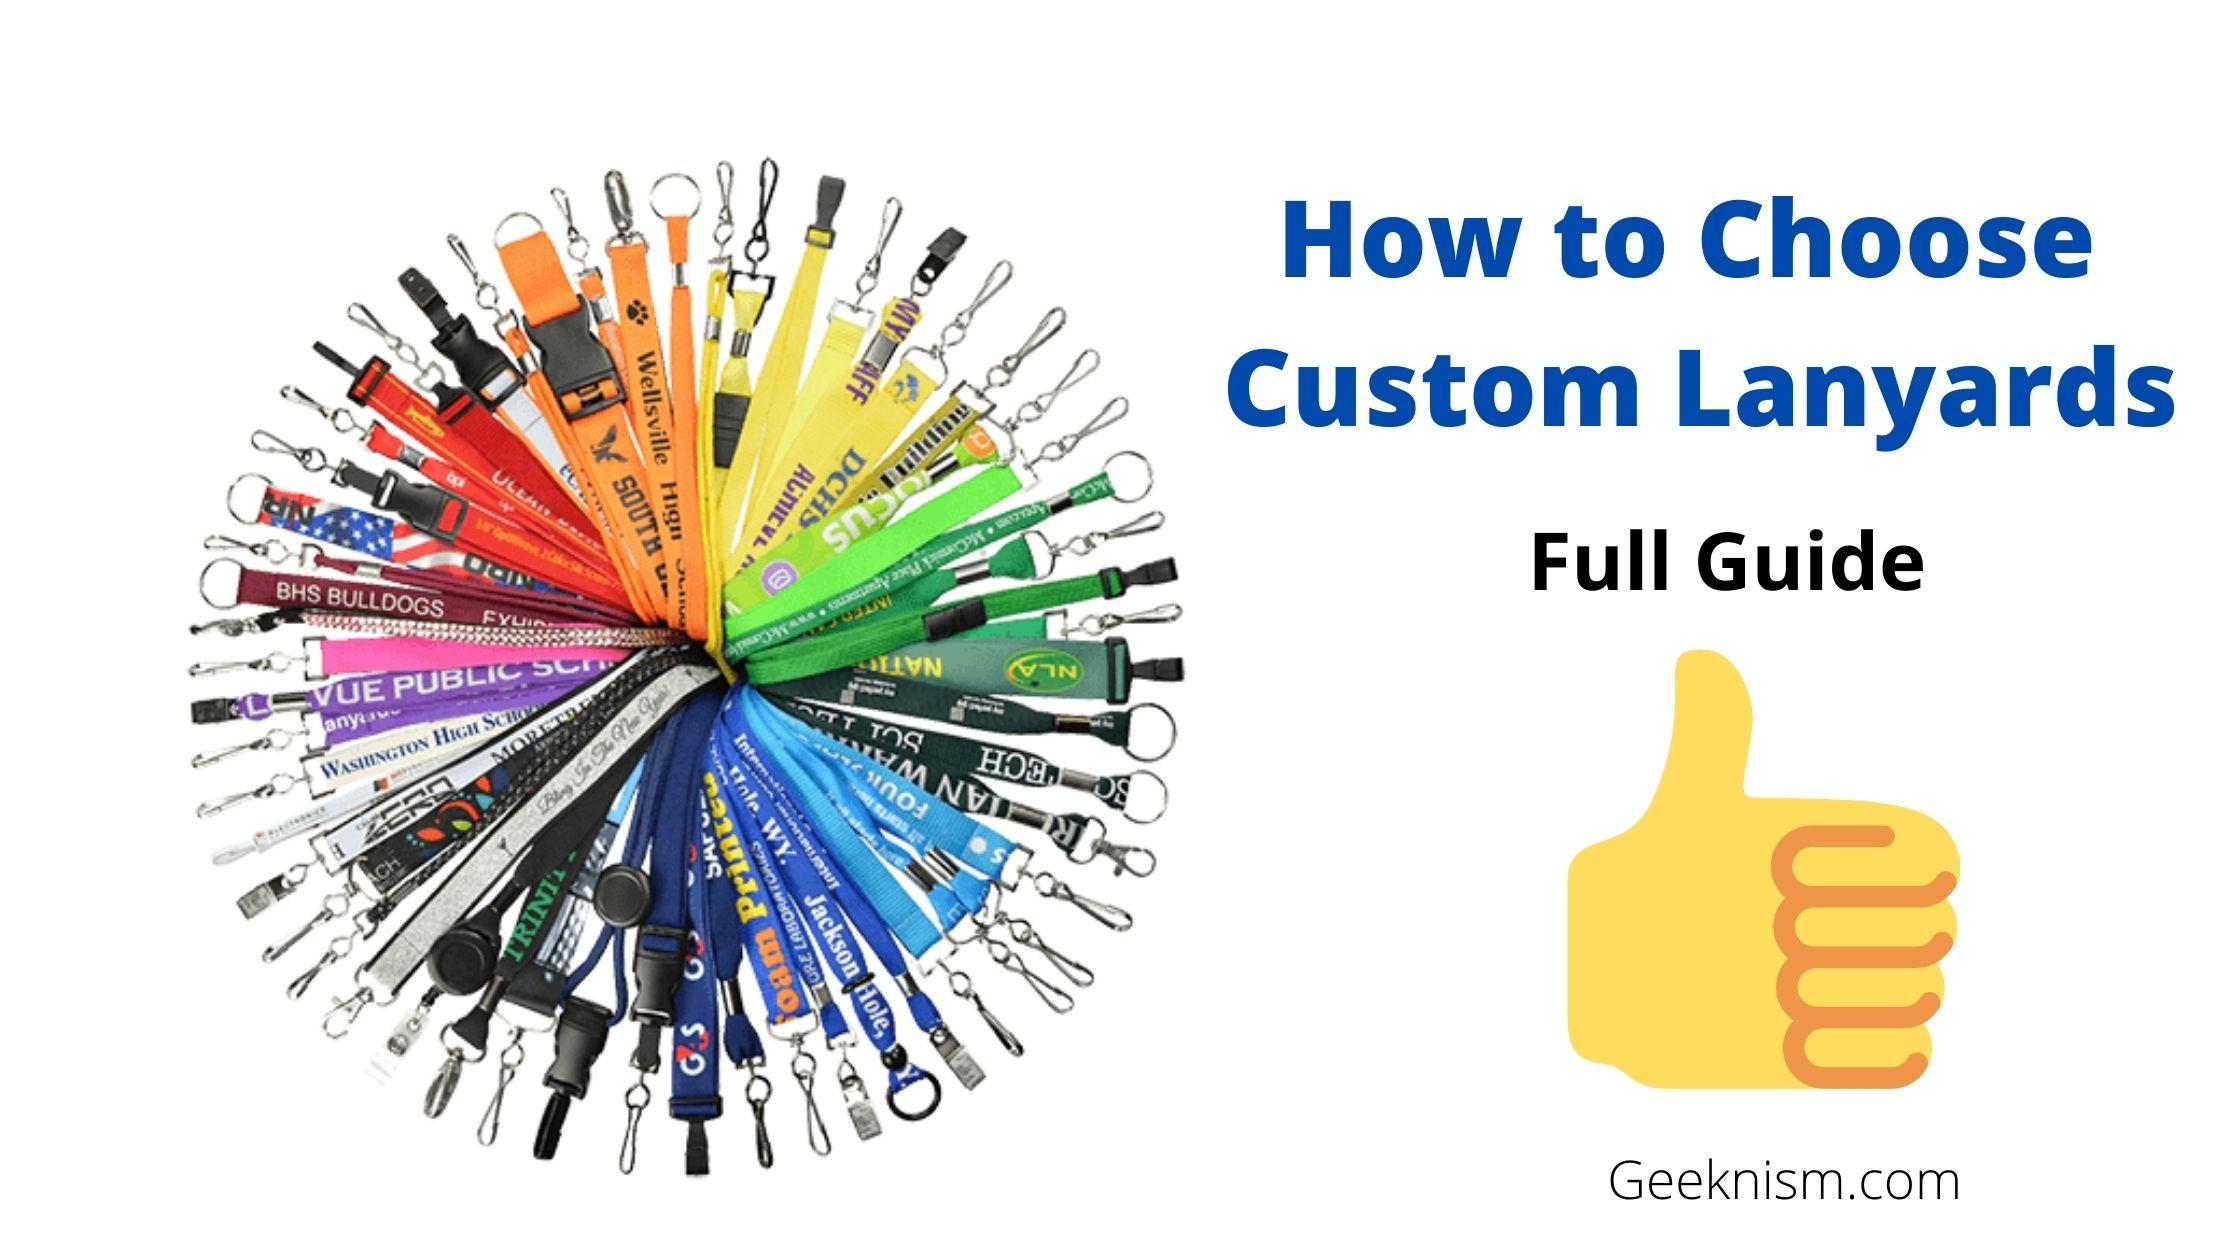 How to Choose Custom Lanyards